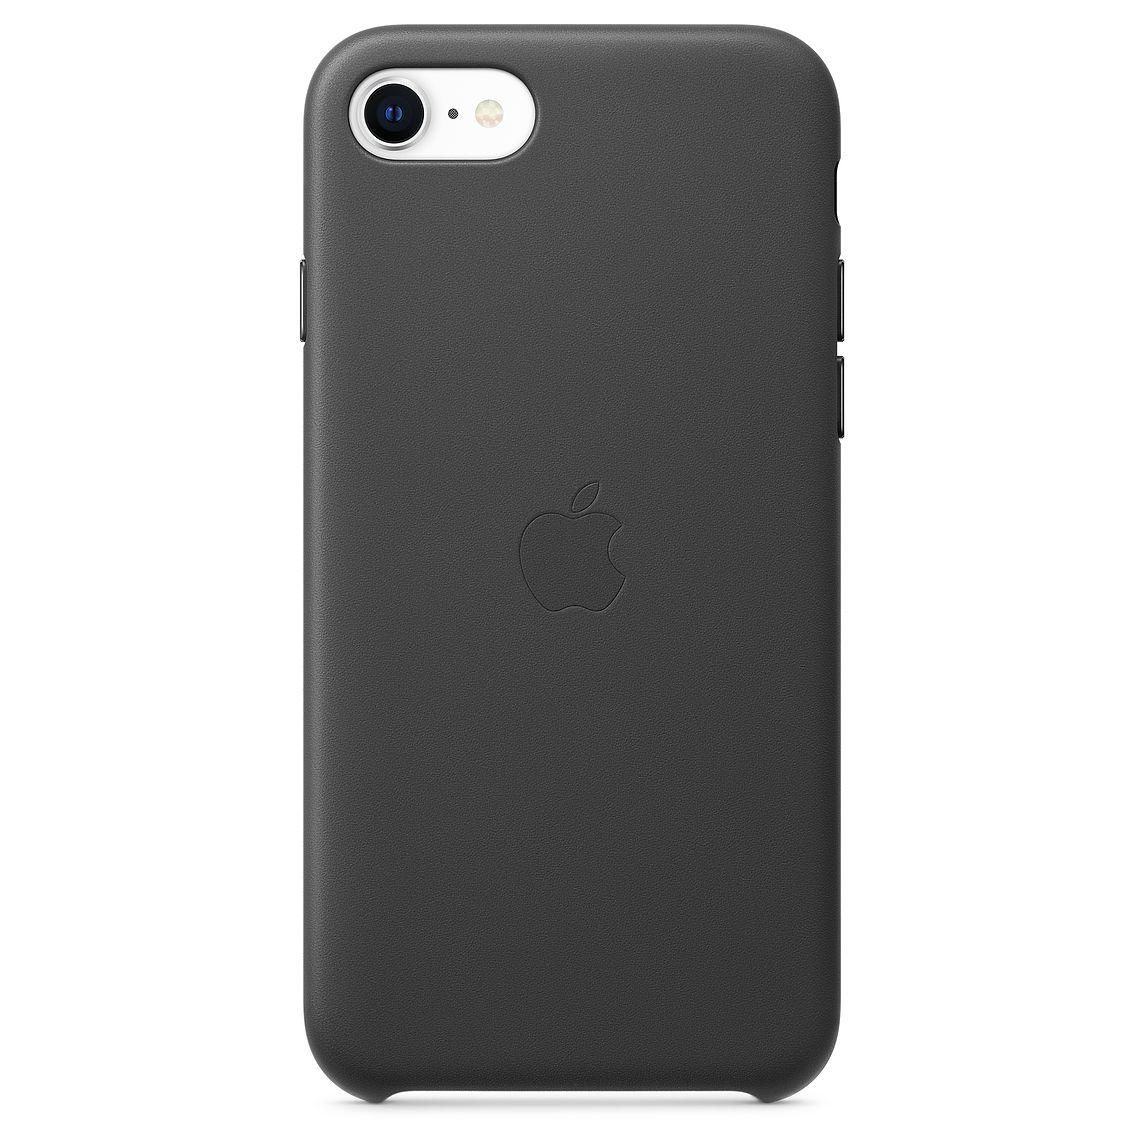 Apple iPhone SE Leather Case Black (2020)